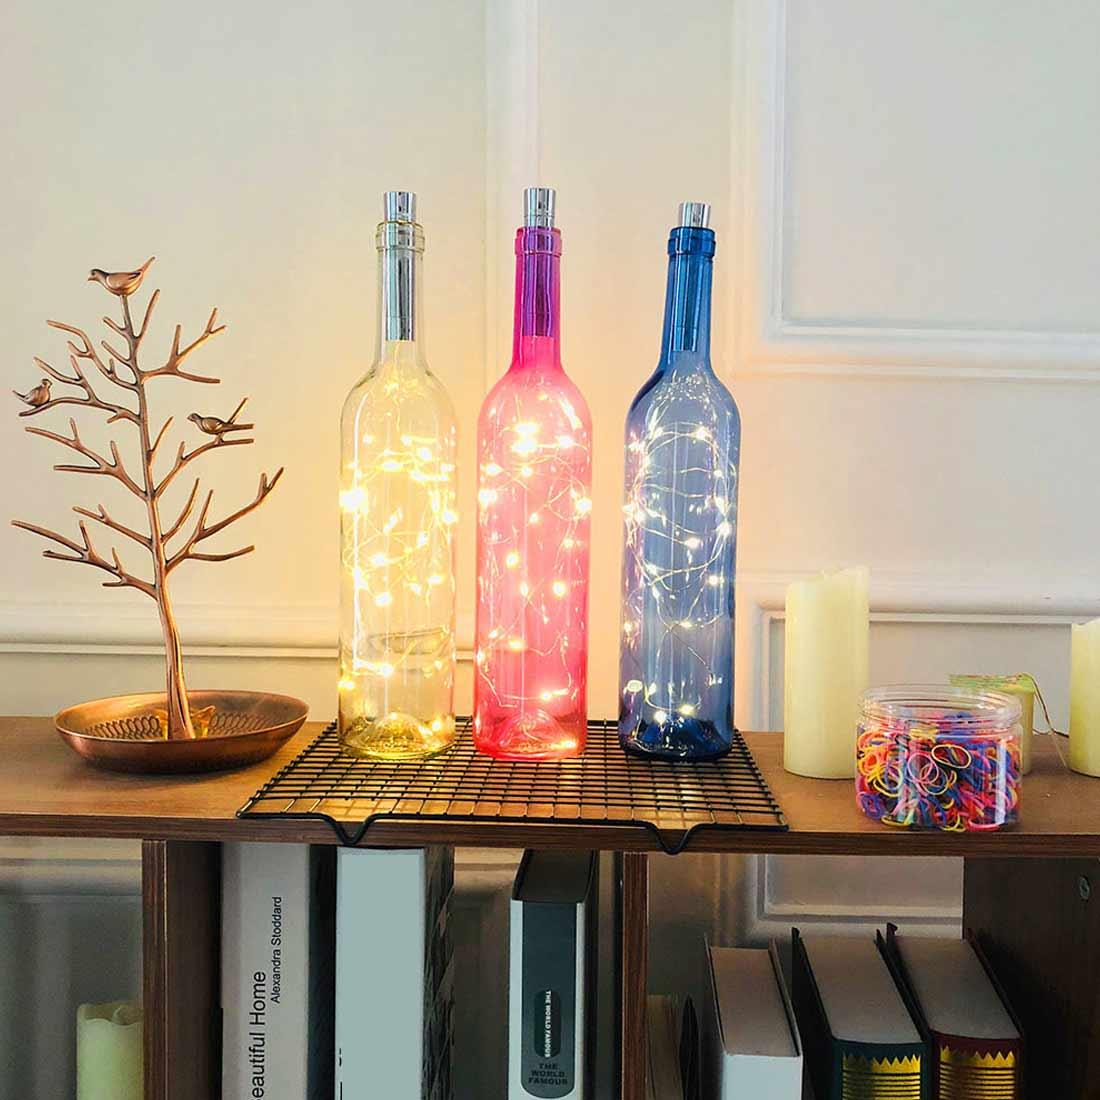 LED Cork Shape Battery1m/1.5m/2m  Power Fairy Light Garland Bottle String Lights  Christmas Decorations For Home Outdoor